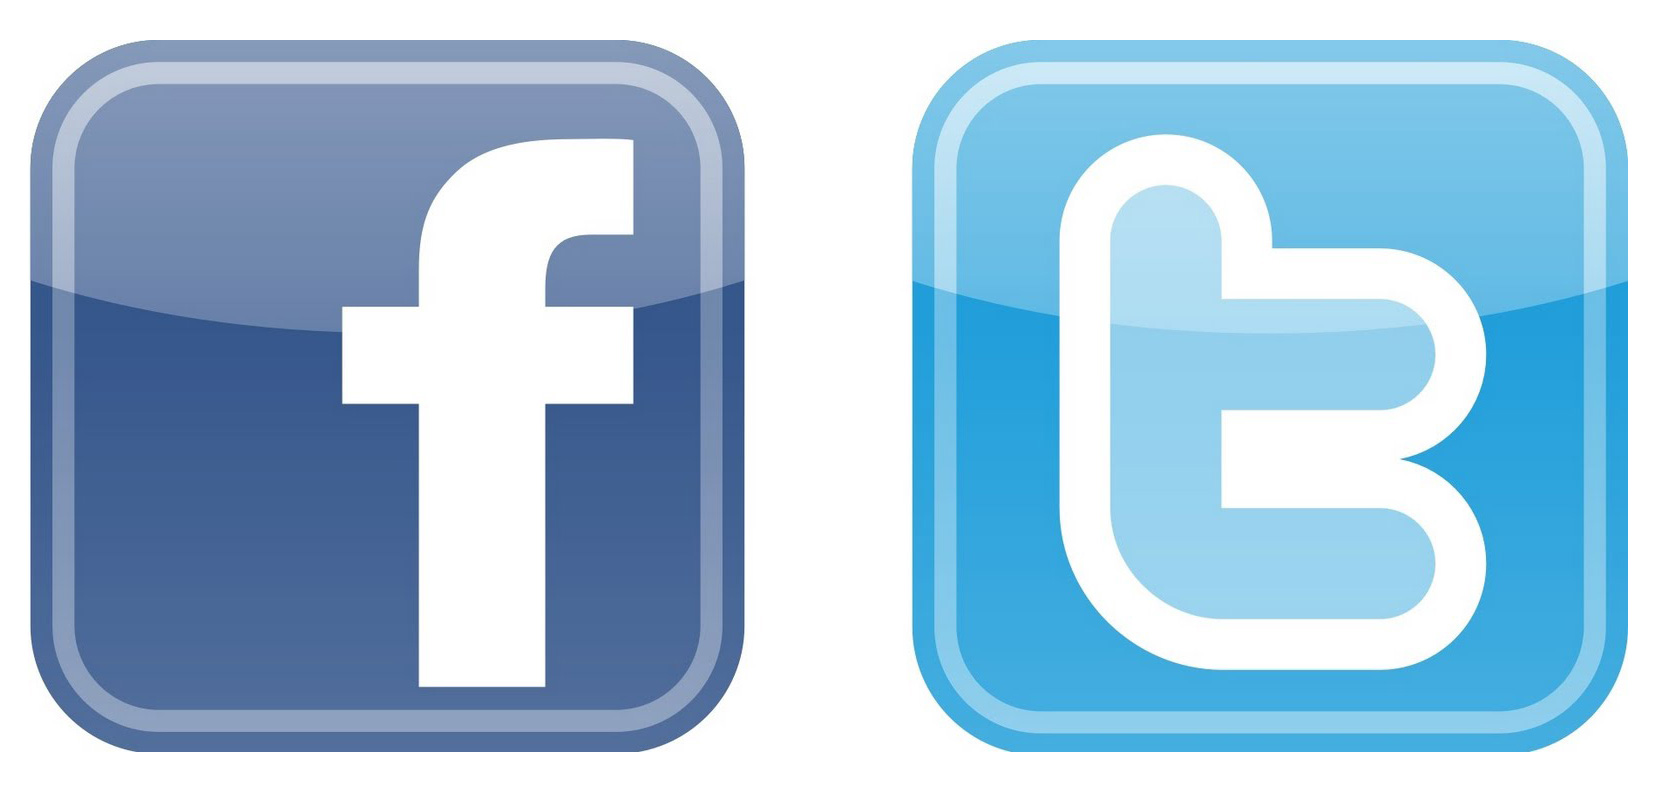 Logos For > Facebook Logo Jpg Download